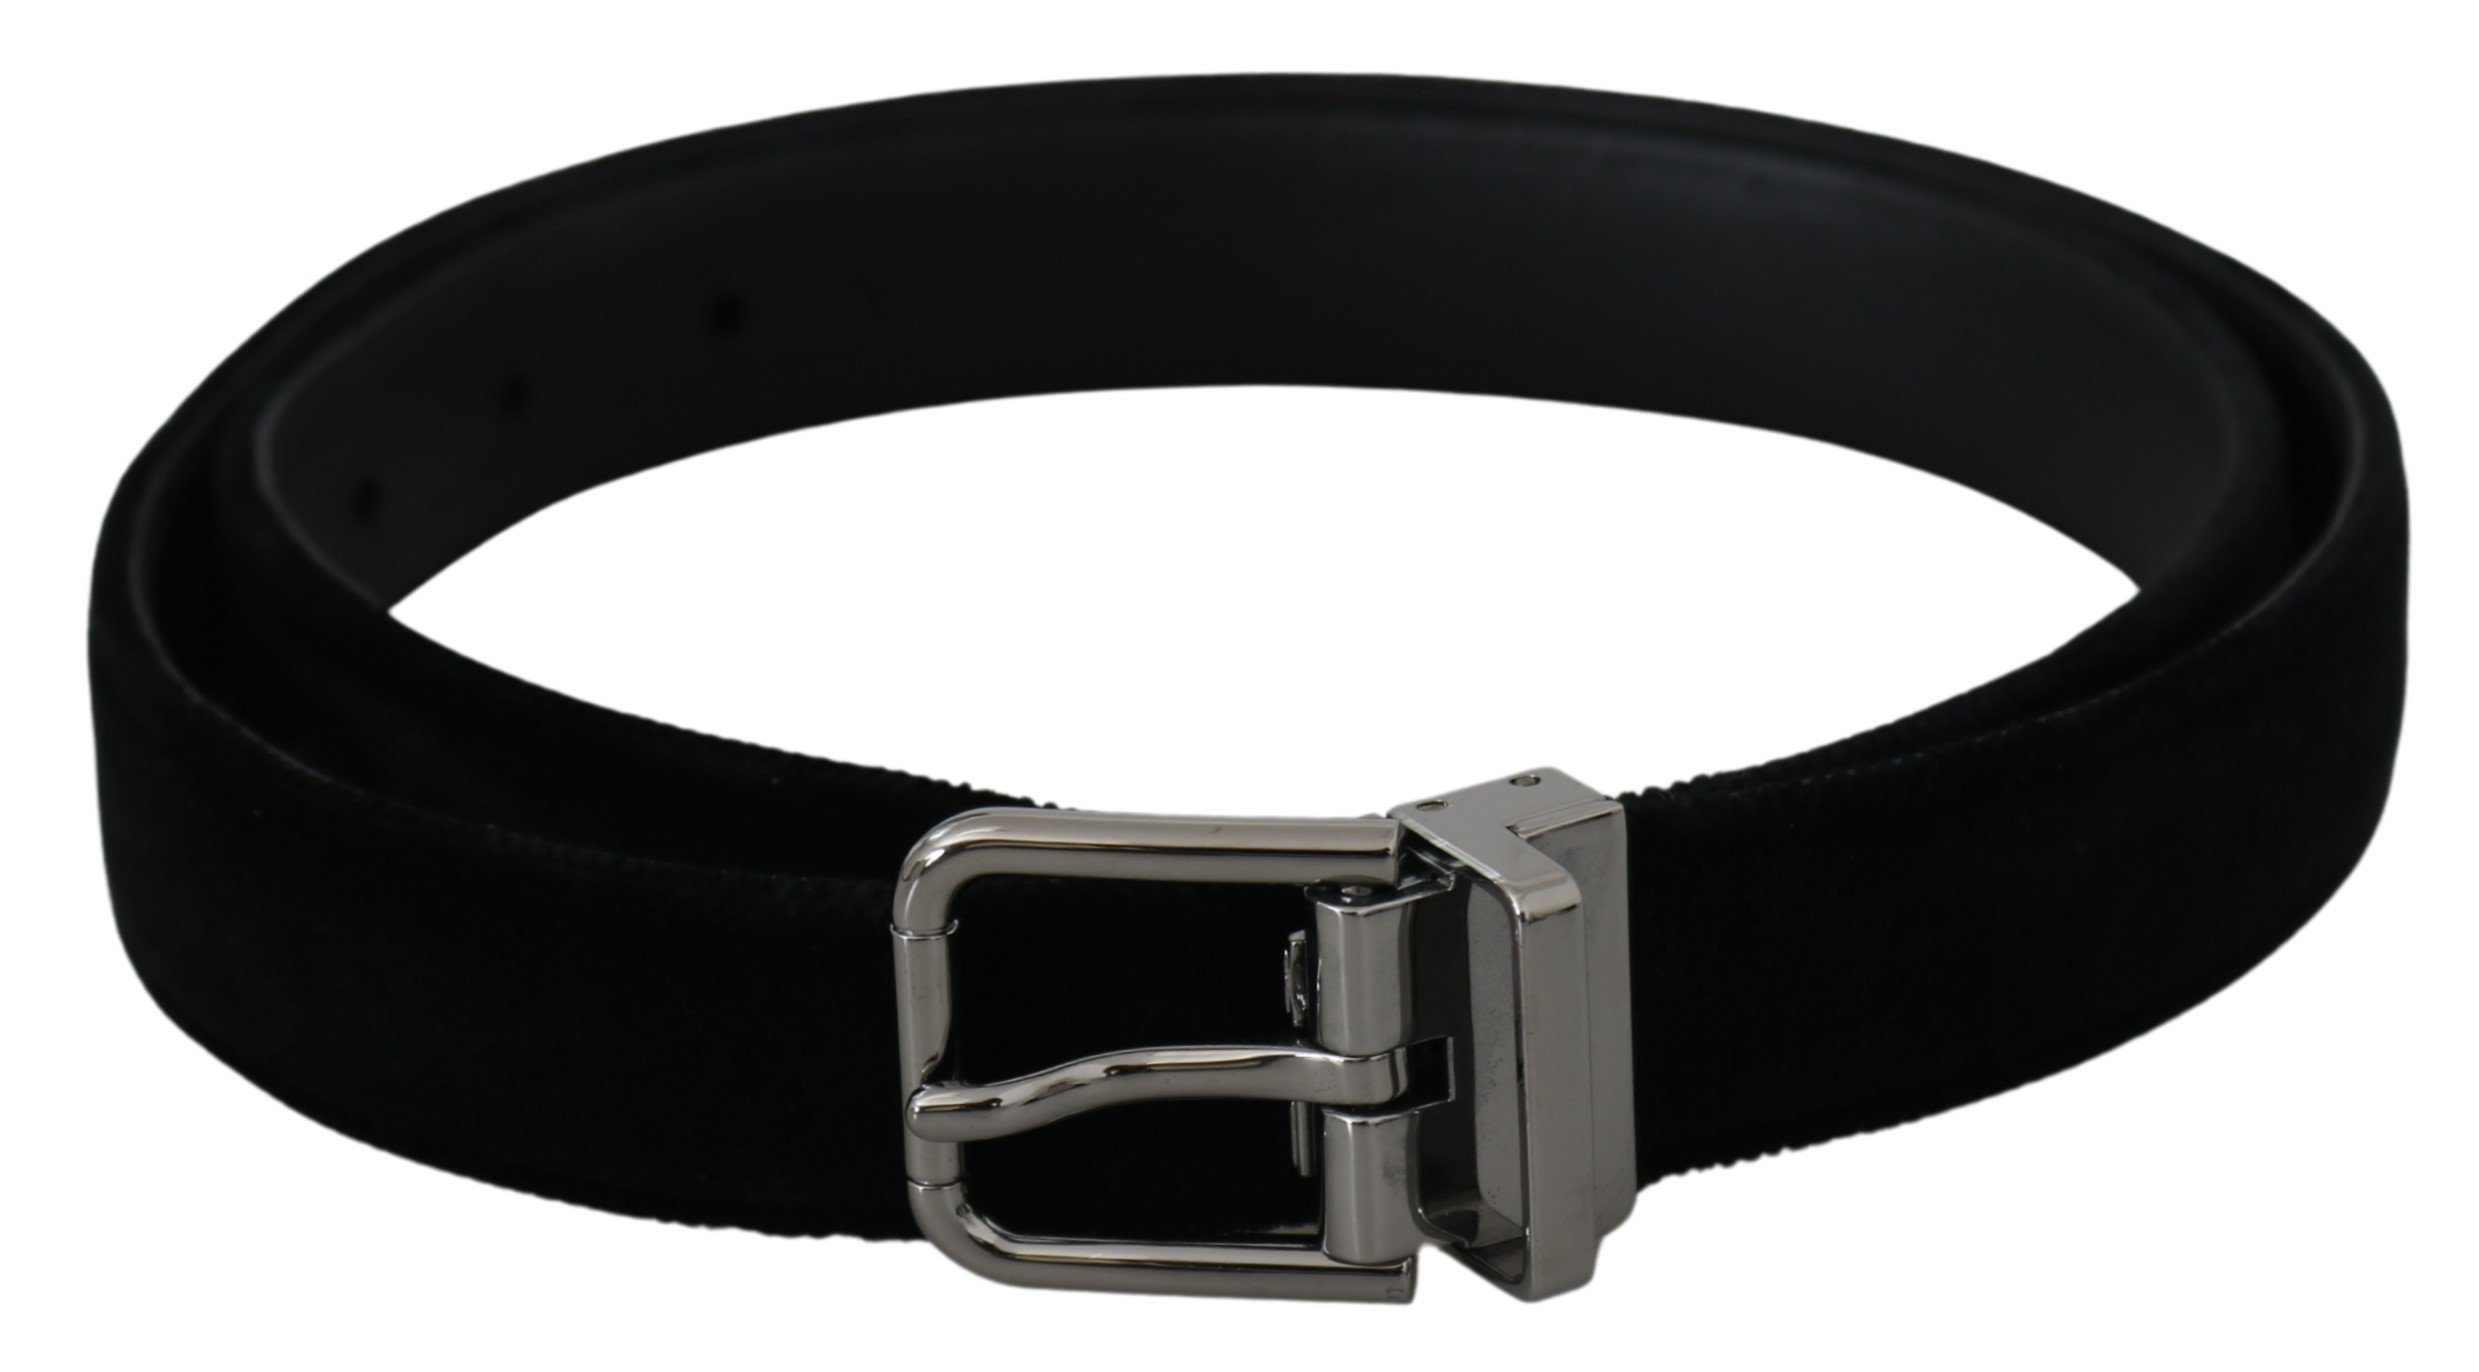 Black Leather Velvet Silver Buckle Belt - 90 cm / 36 Inches